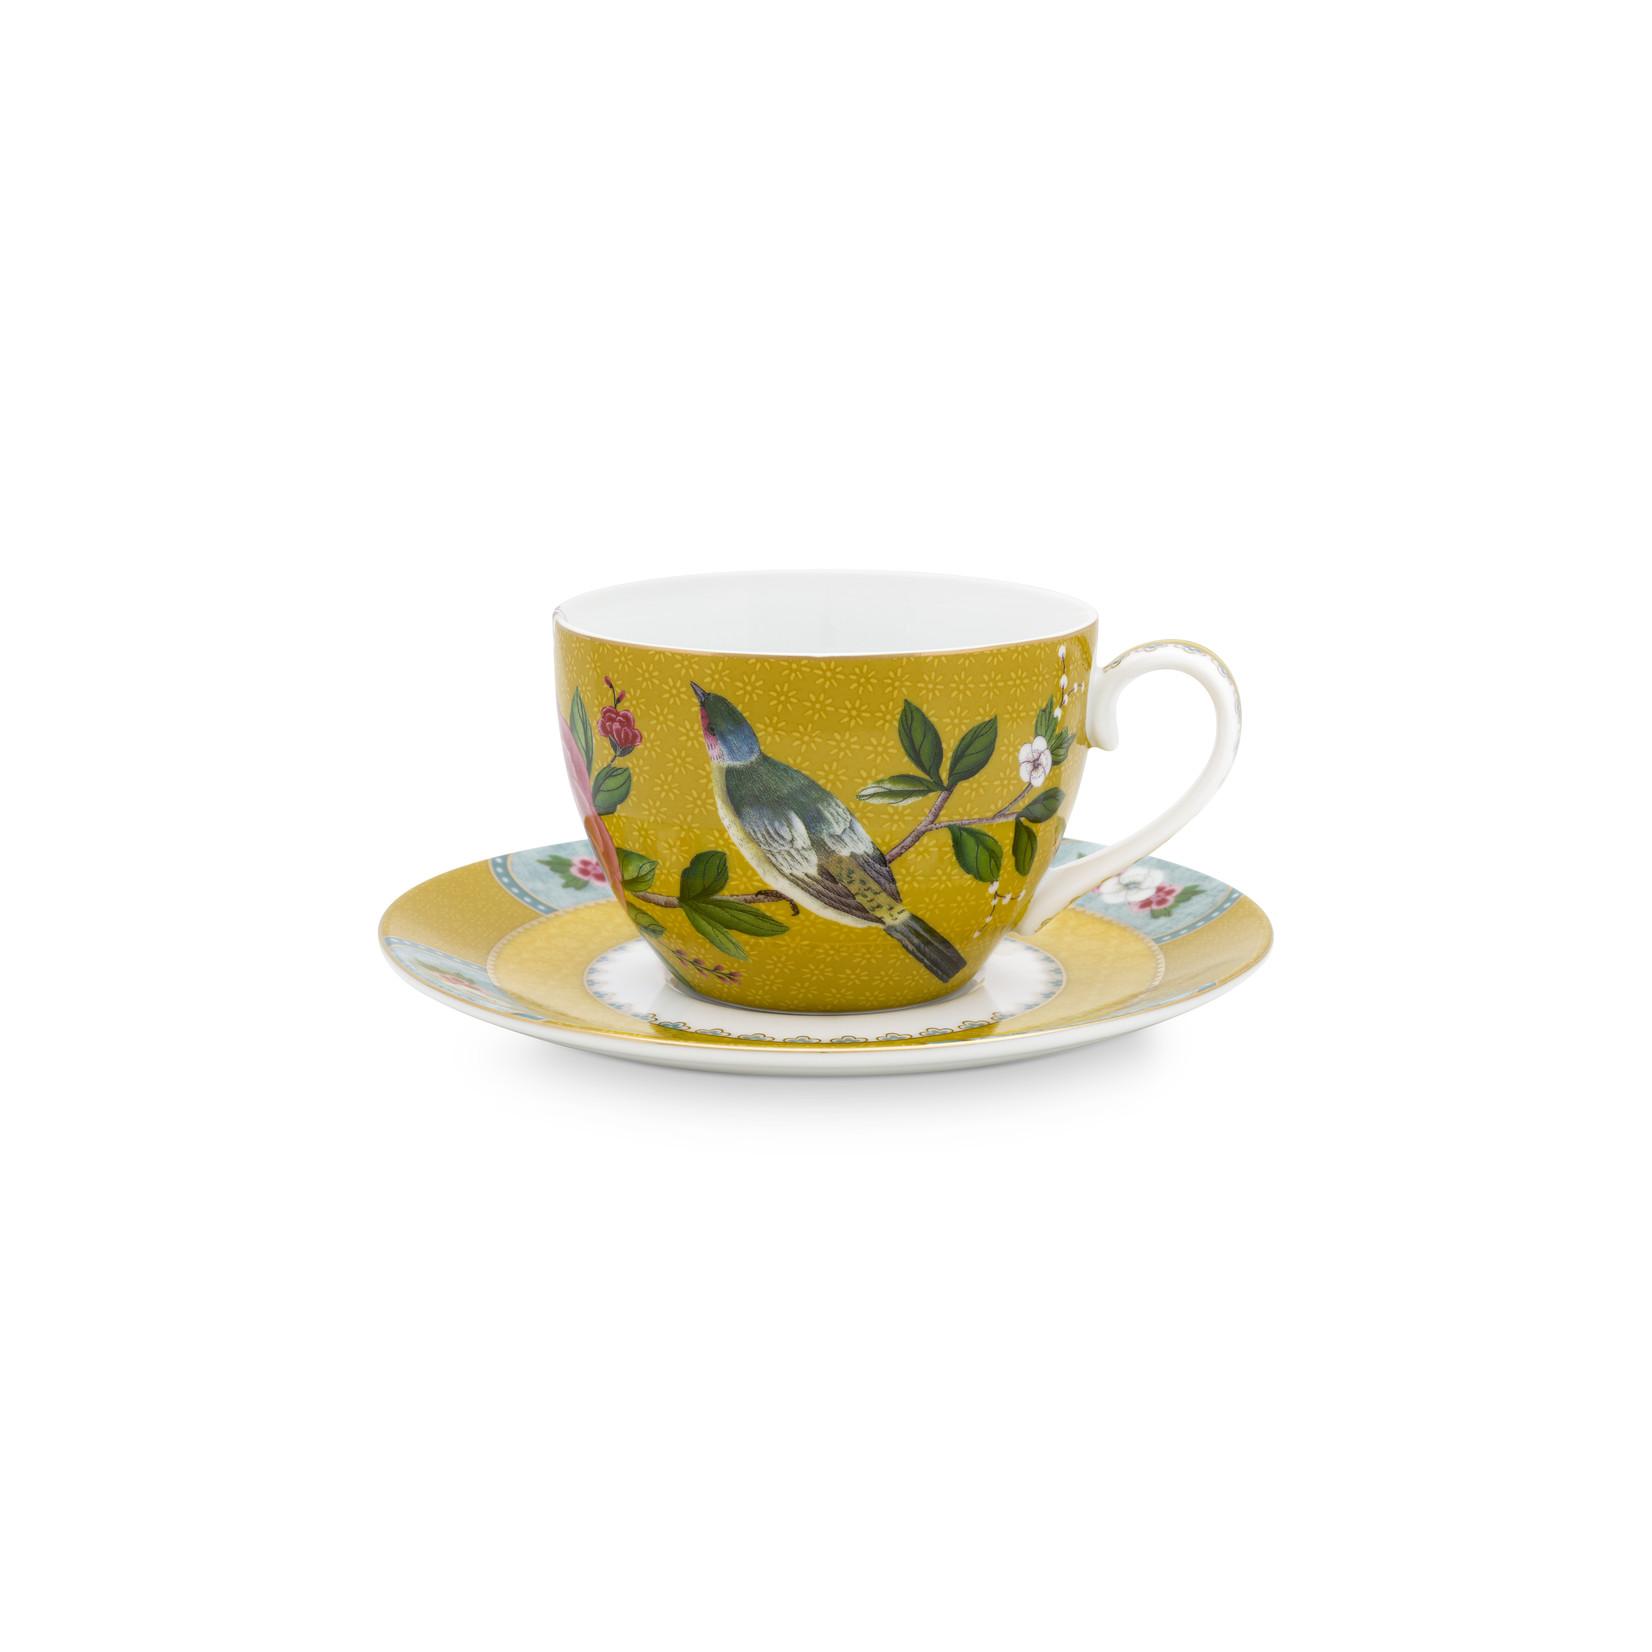 PIP Studio Cup & Saucer Blushing Birds Yellow